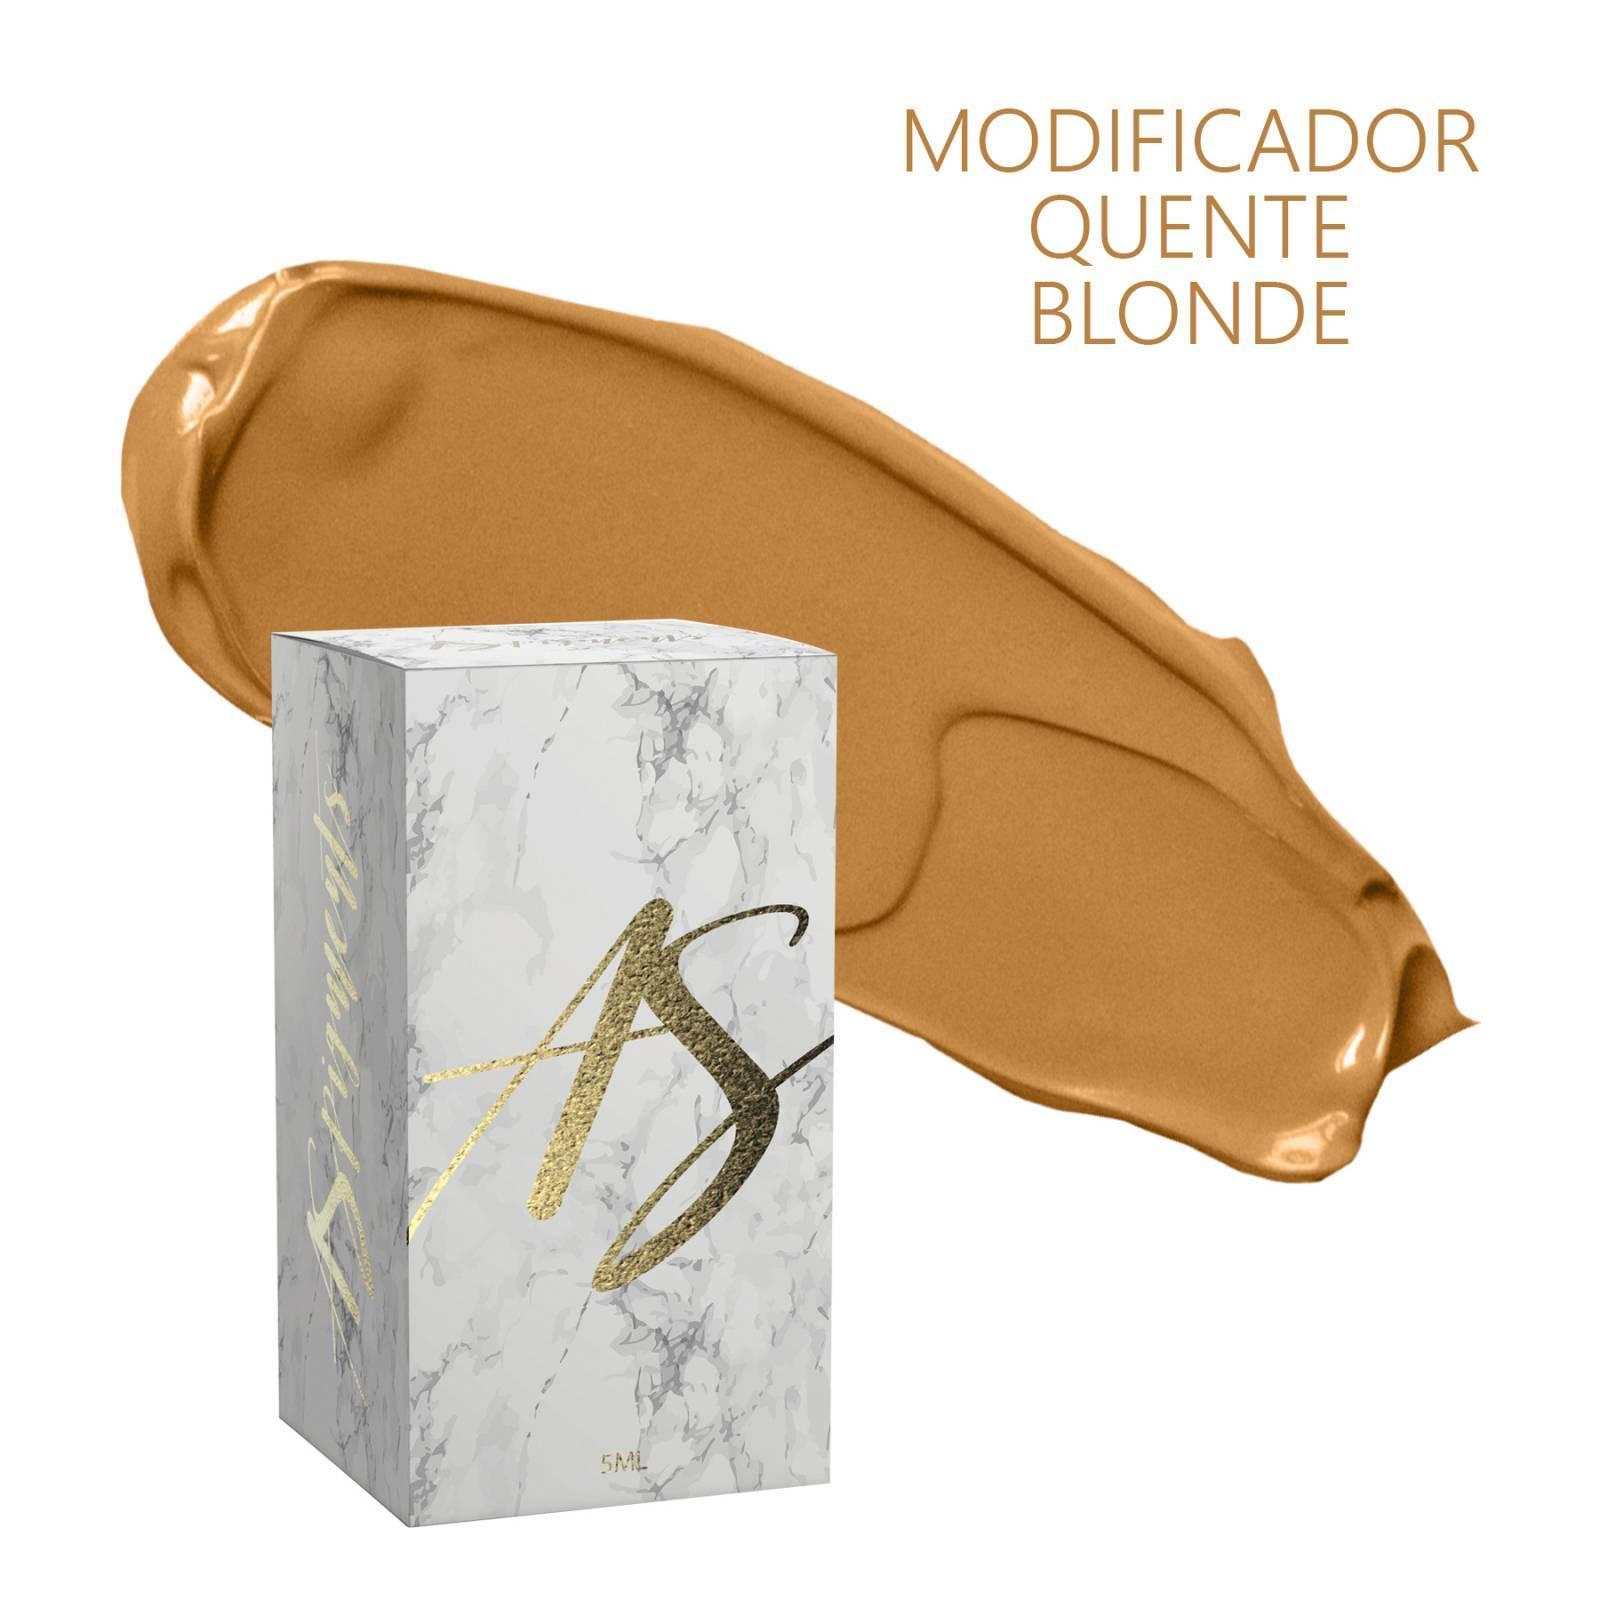 Pigmento Modificador quente Blonde- embalagem 5 ml - Loja Ana Paulla